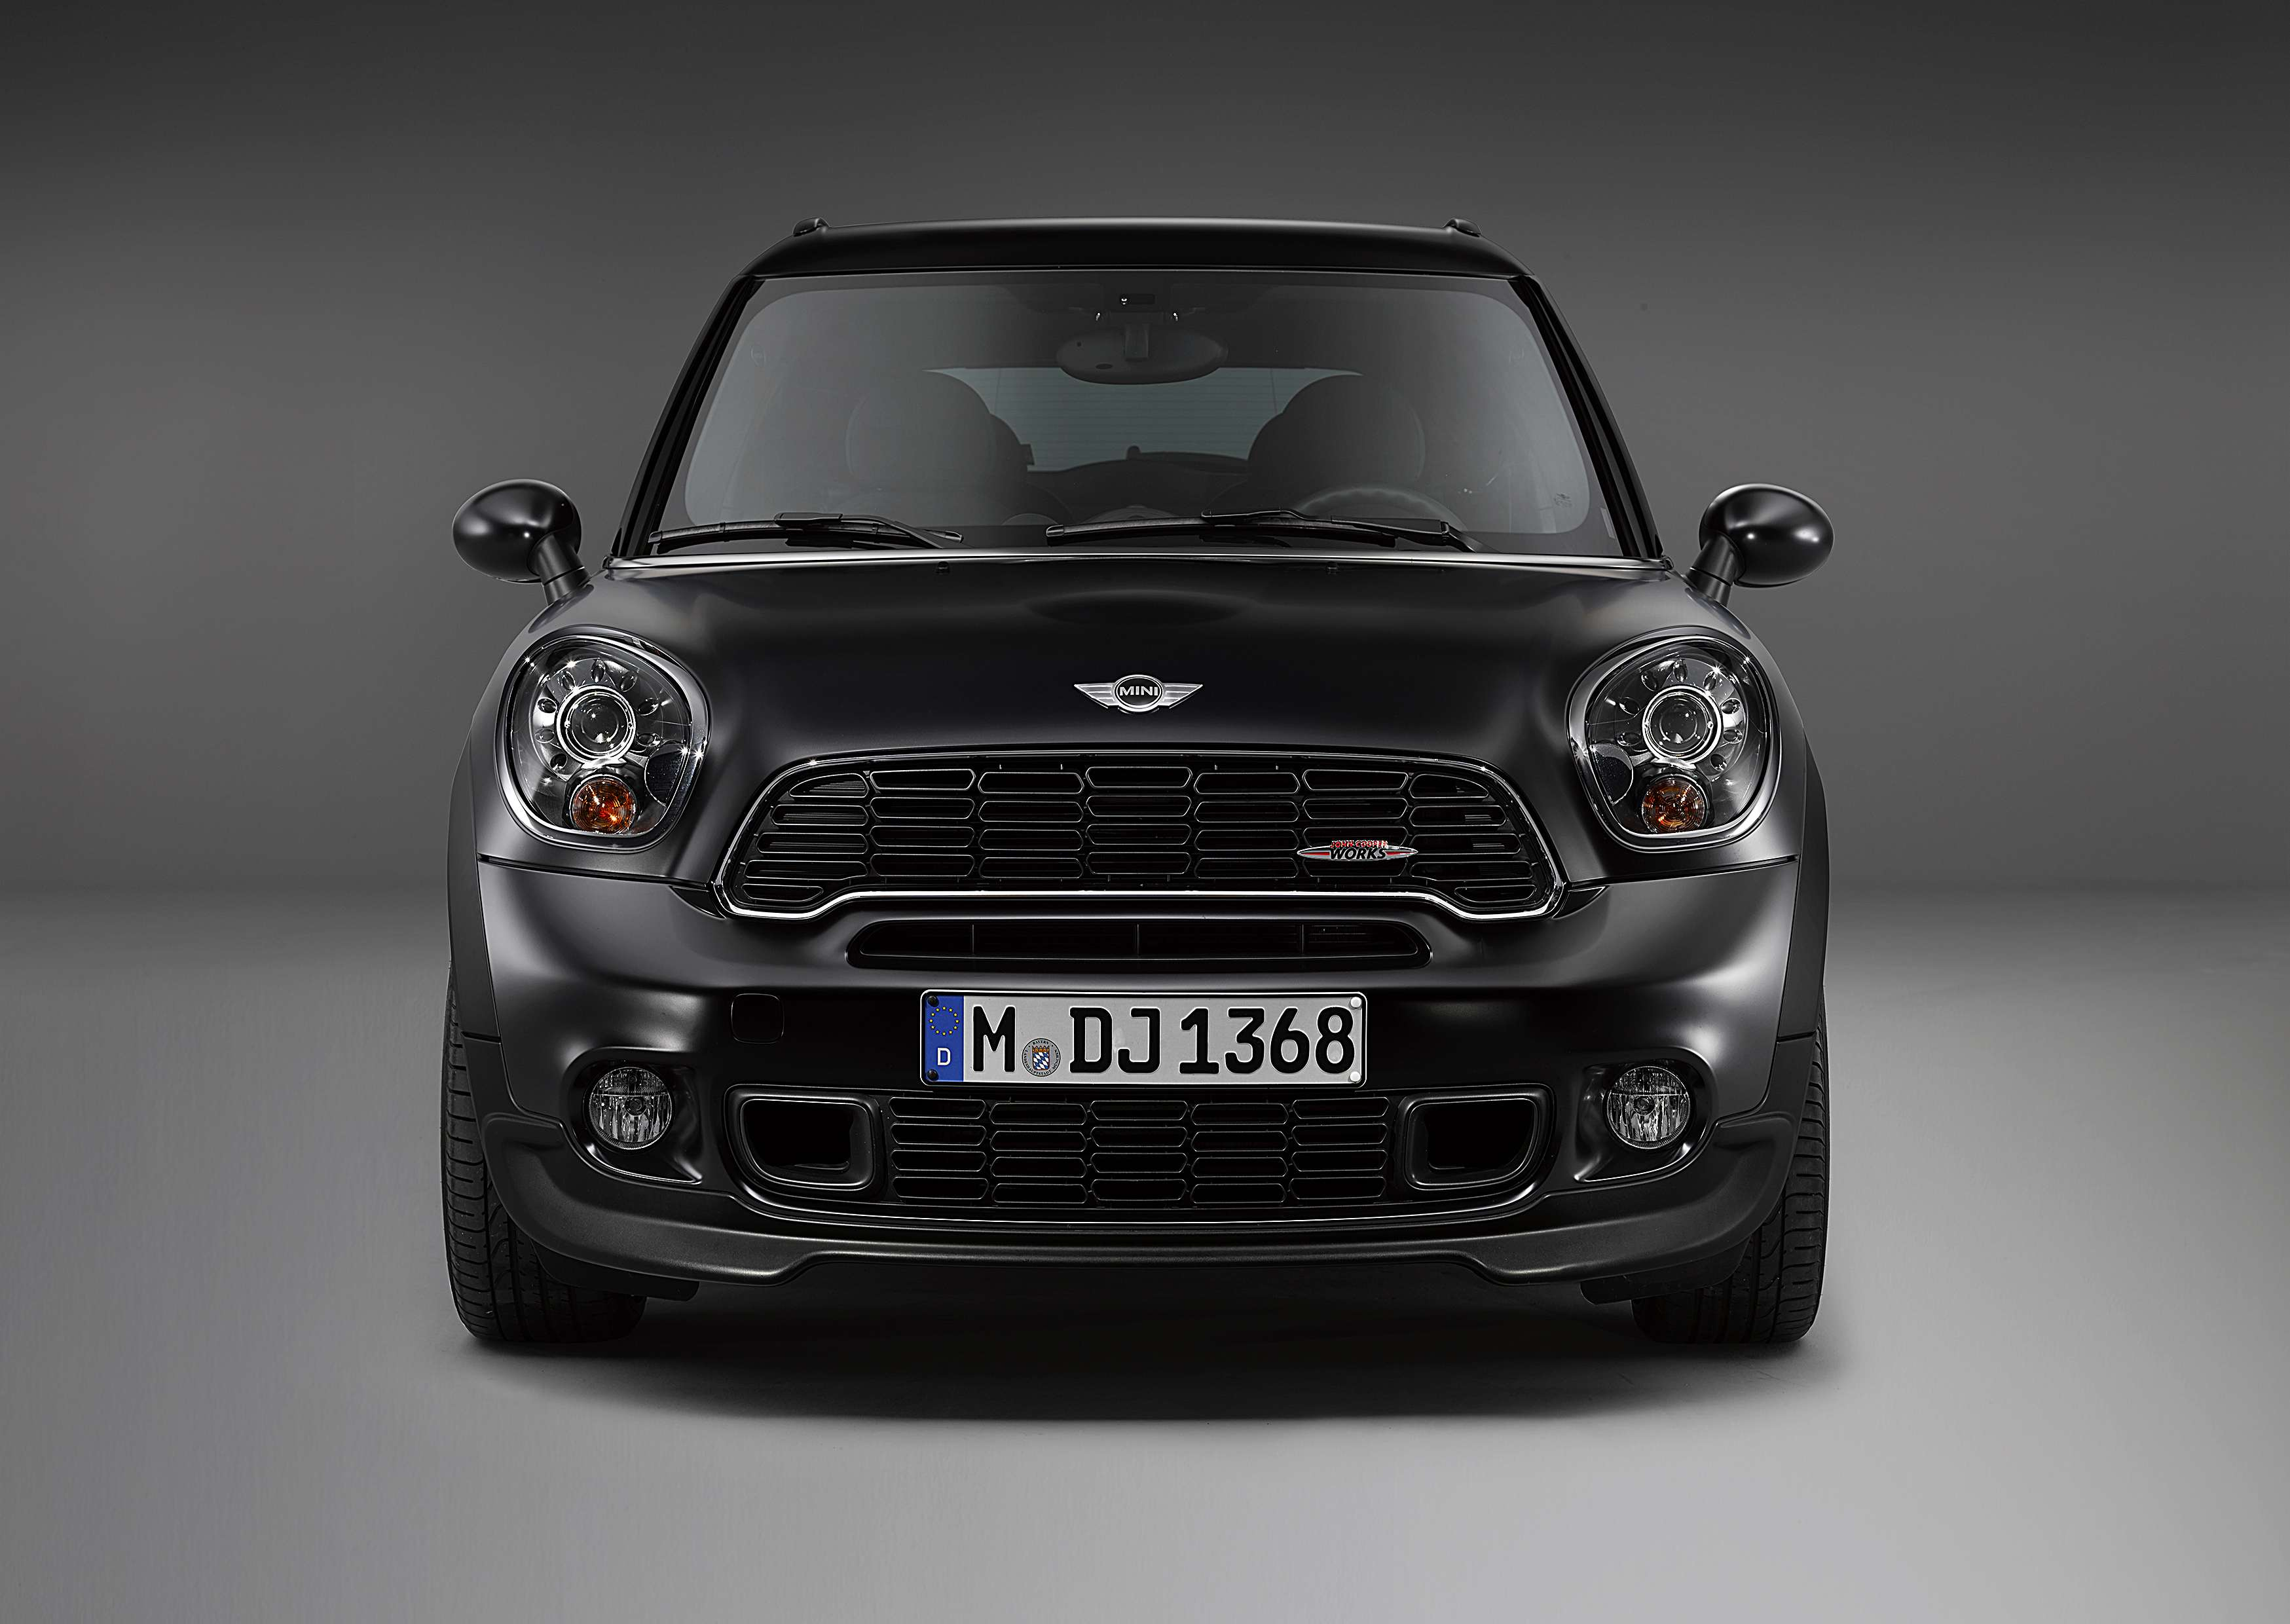 Frozen Black For Mini: Latest News - Surf4cars - Surf4cars.co.za ...